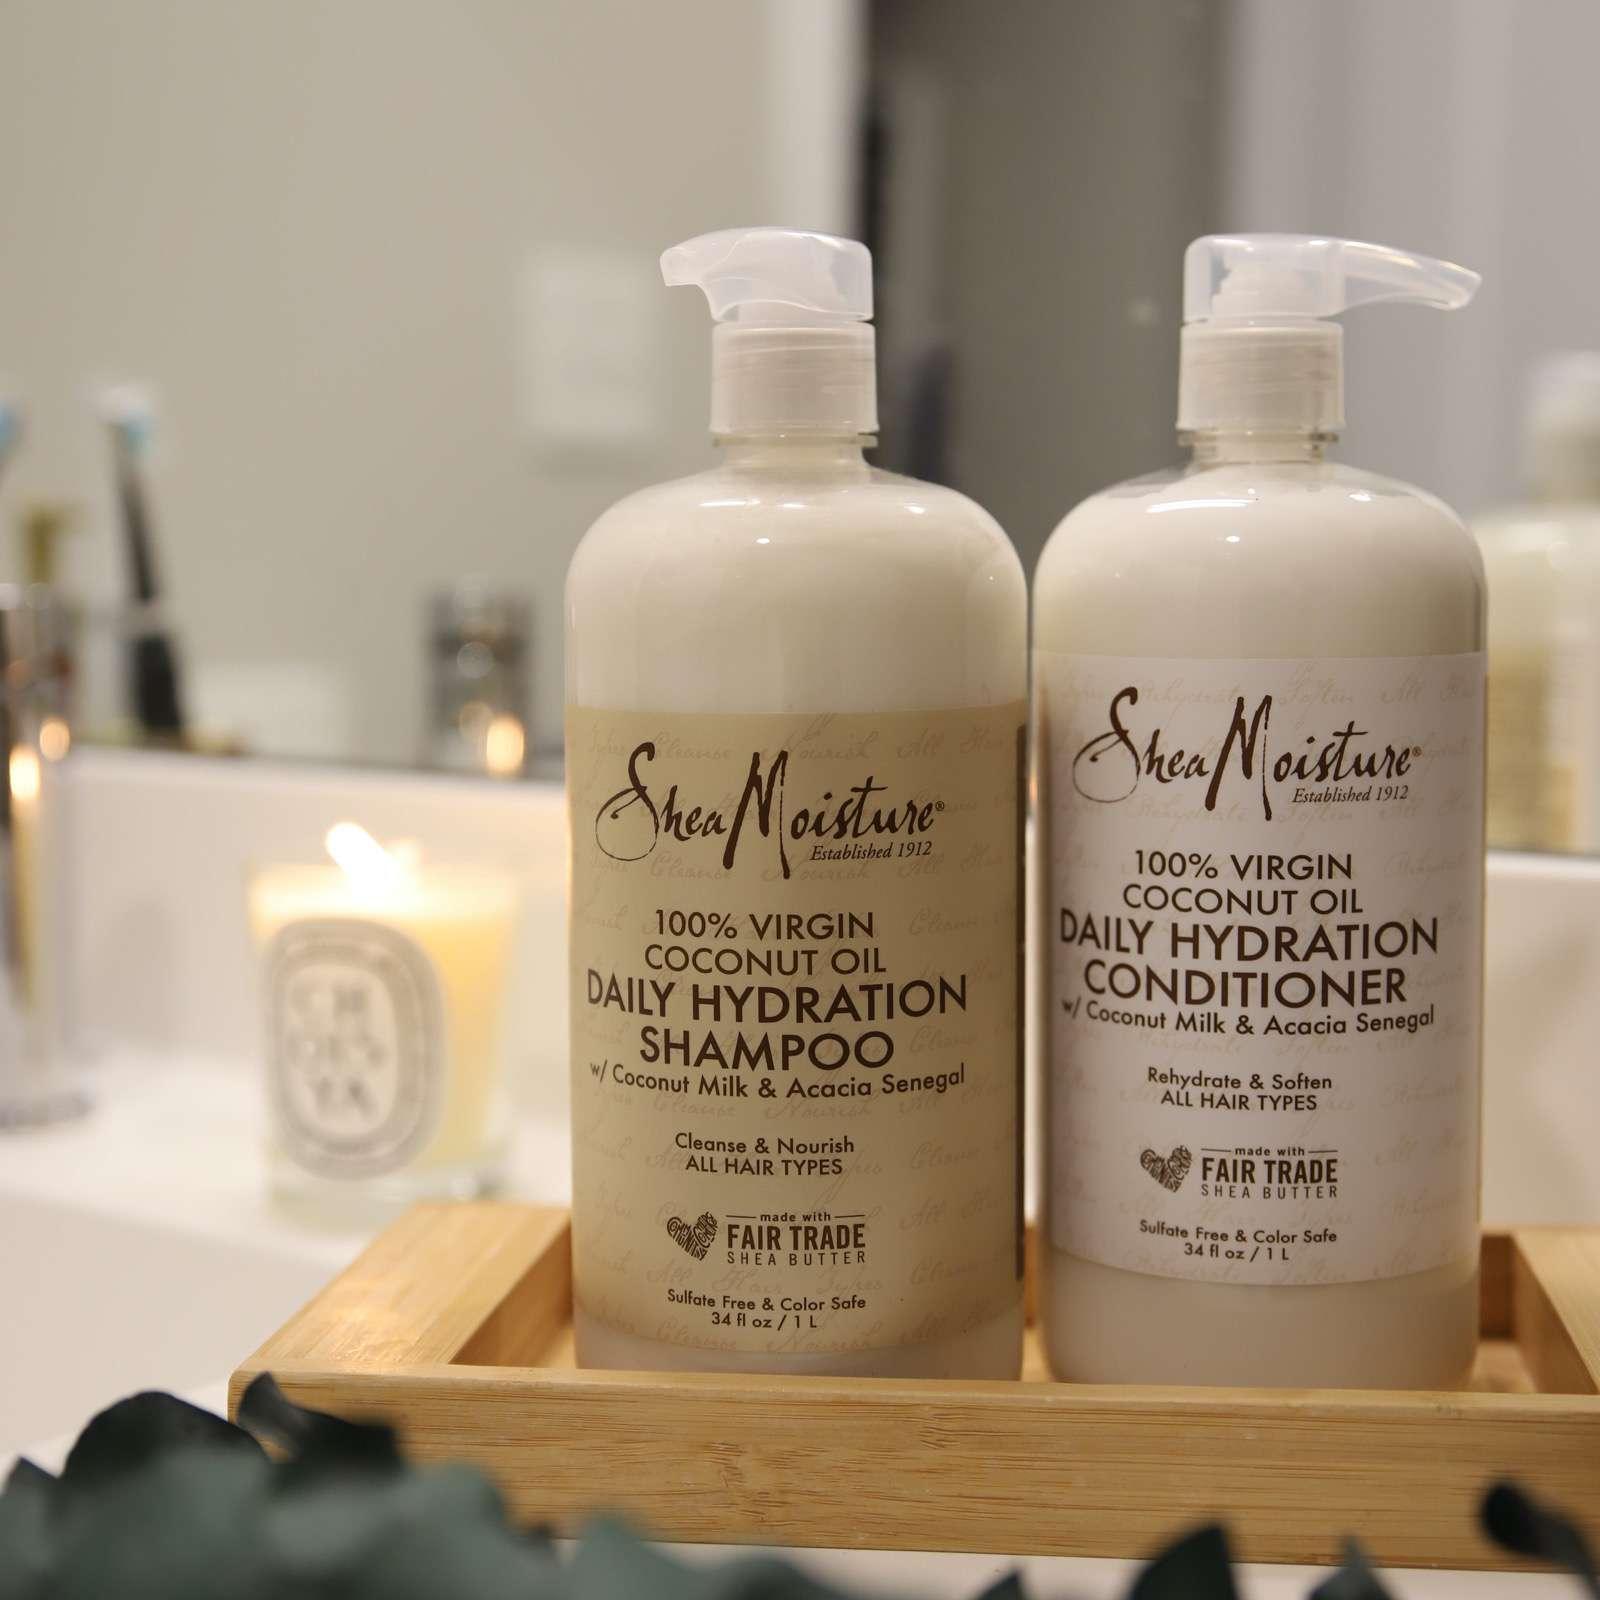 Shea Moisture 100% Virgin Coconut Oil Hydration Shampoo & Conditioner